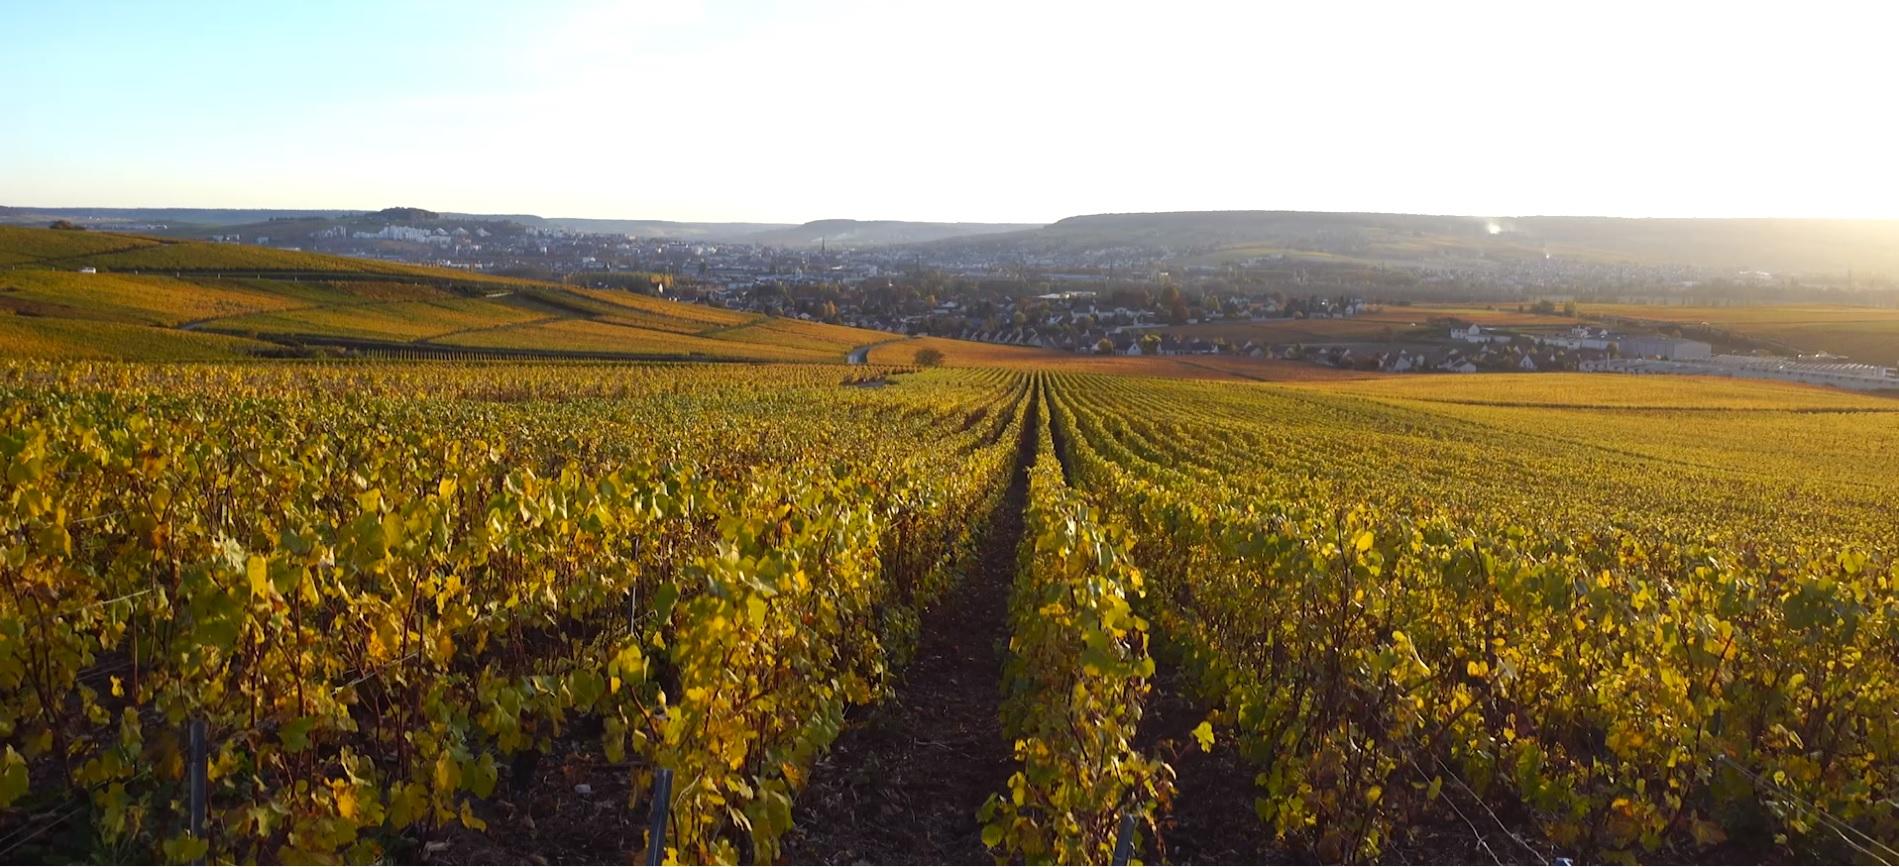 Vineyard Cover